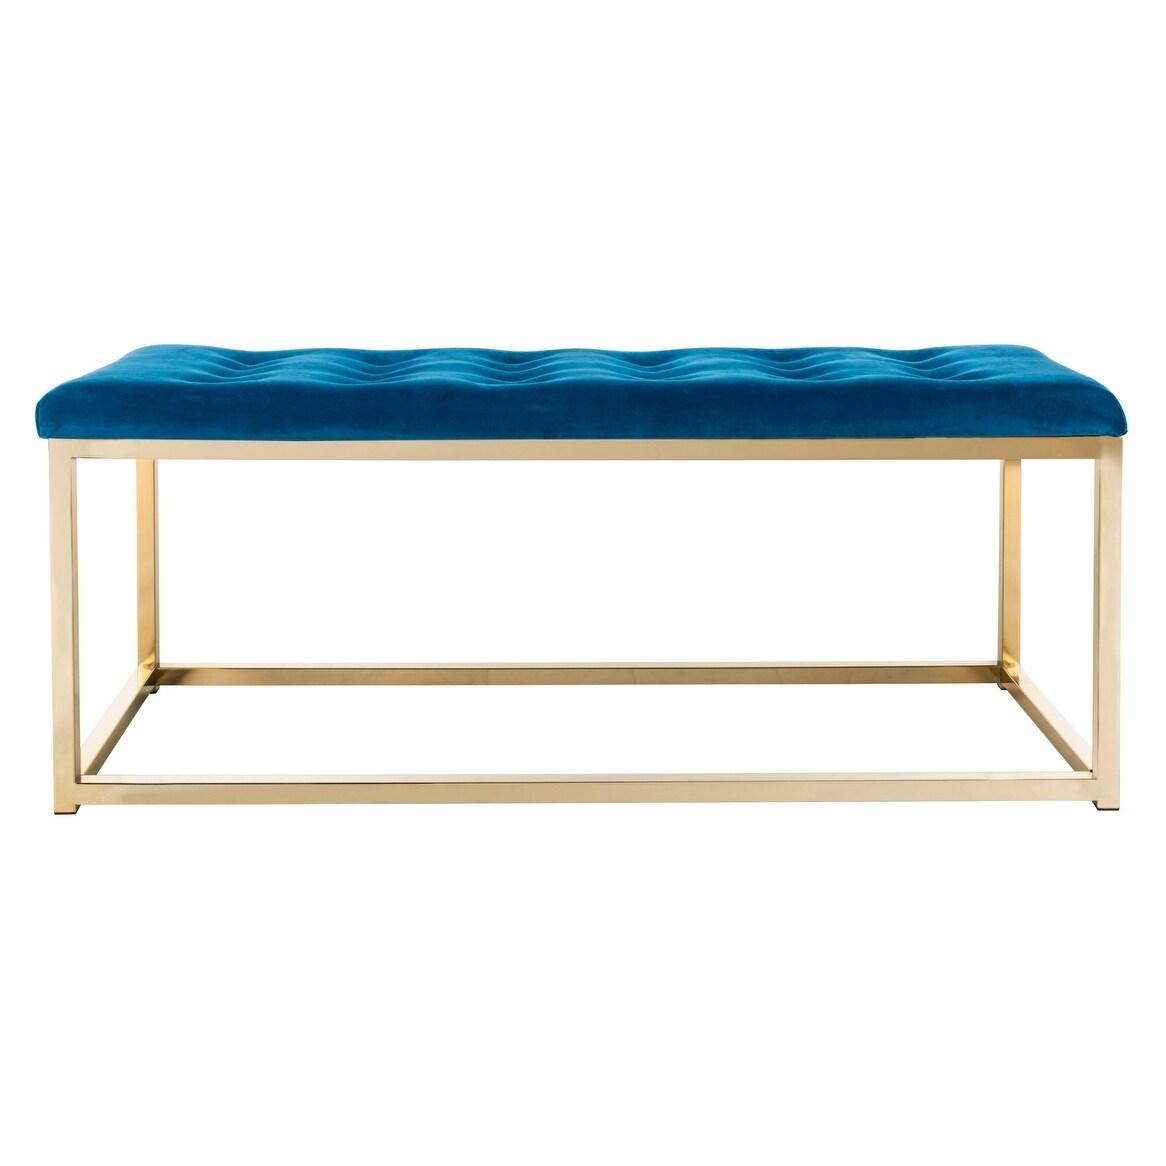 Surprising Safavieh Reynolds Navy Brass Glam Bench 48 X 18 X 19 Spiritservingveterans Wood Chair Design Ideas Spiritservingveteransorg